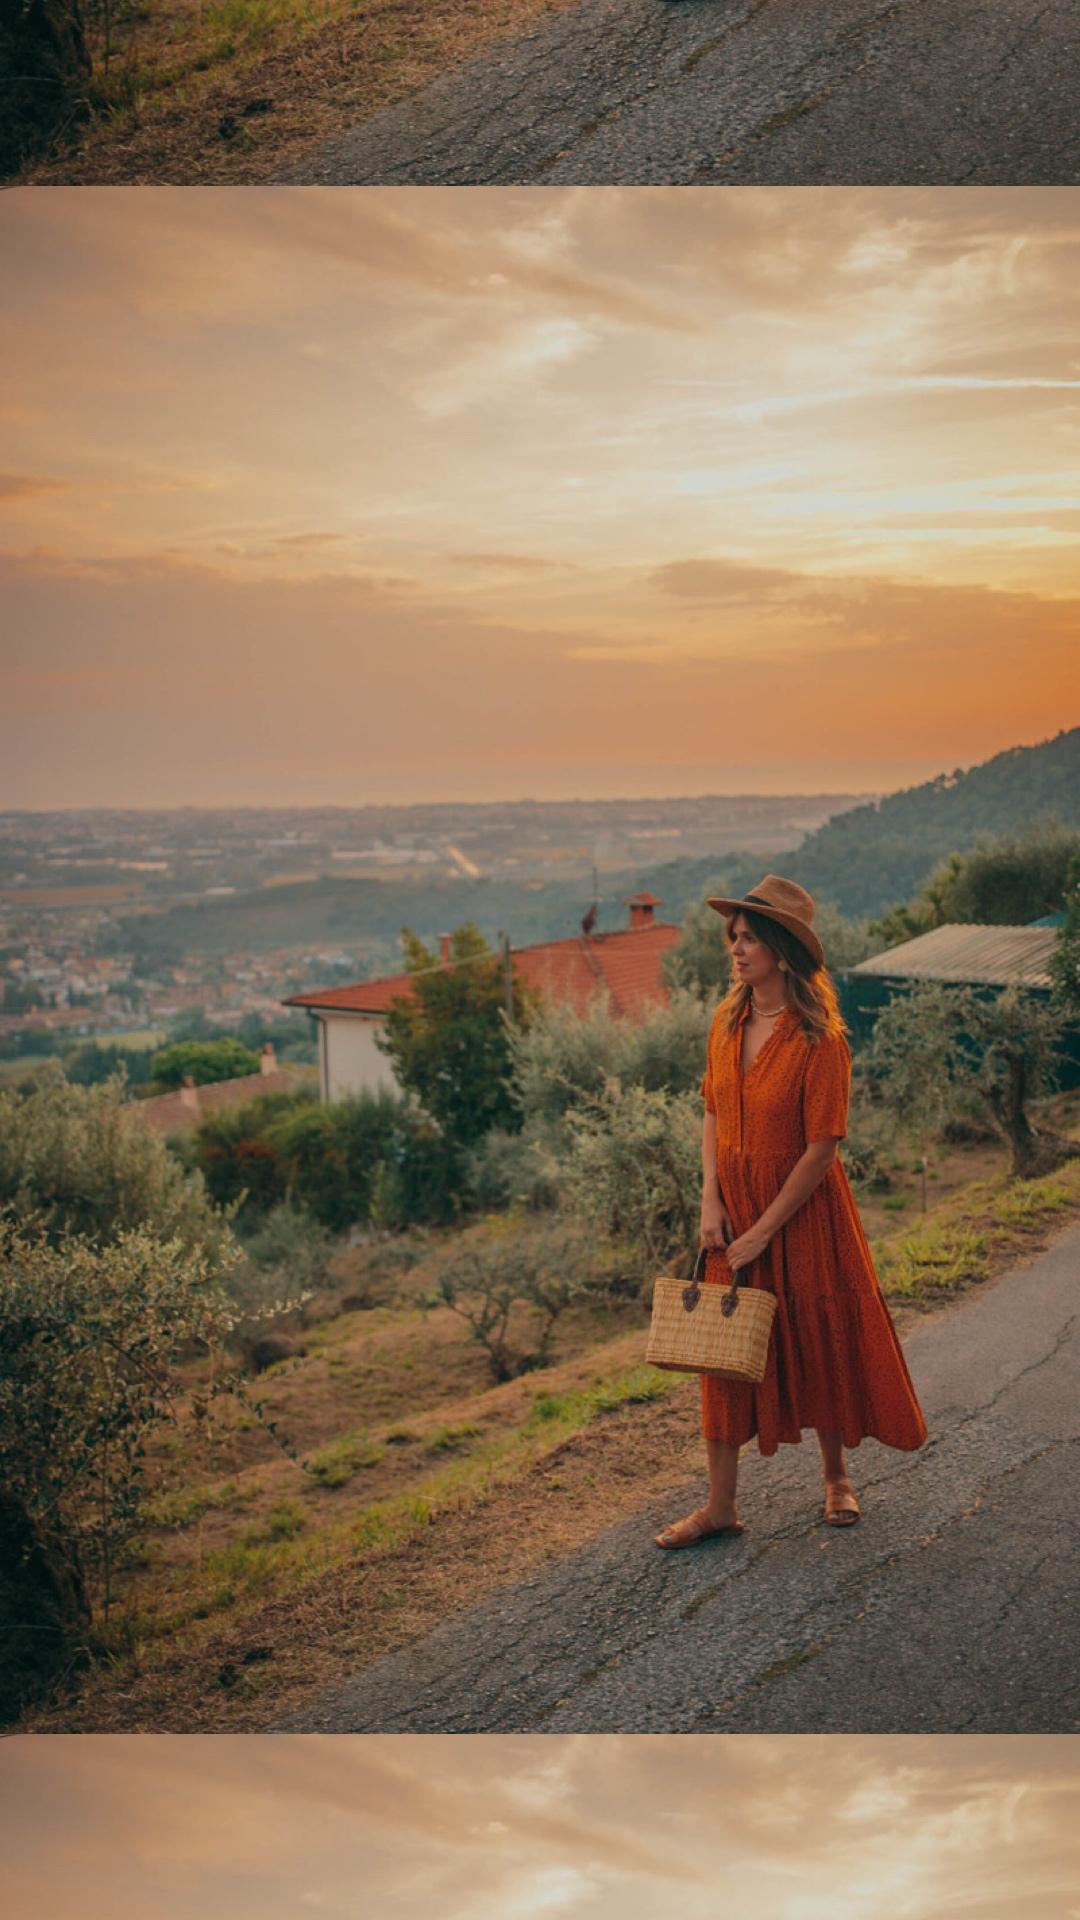 Travel: two weeks in Viareggio